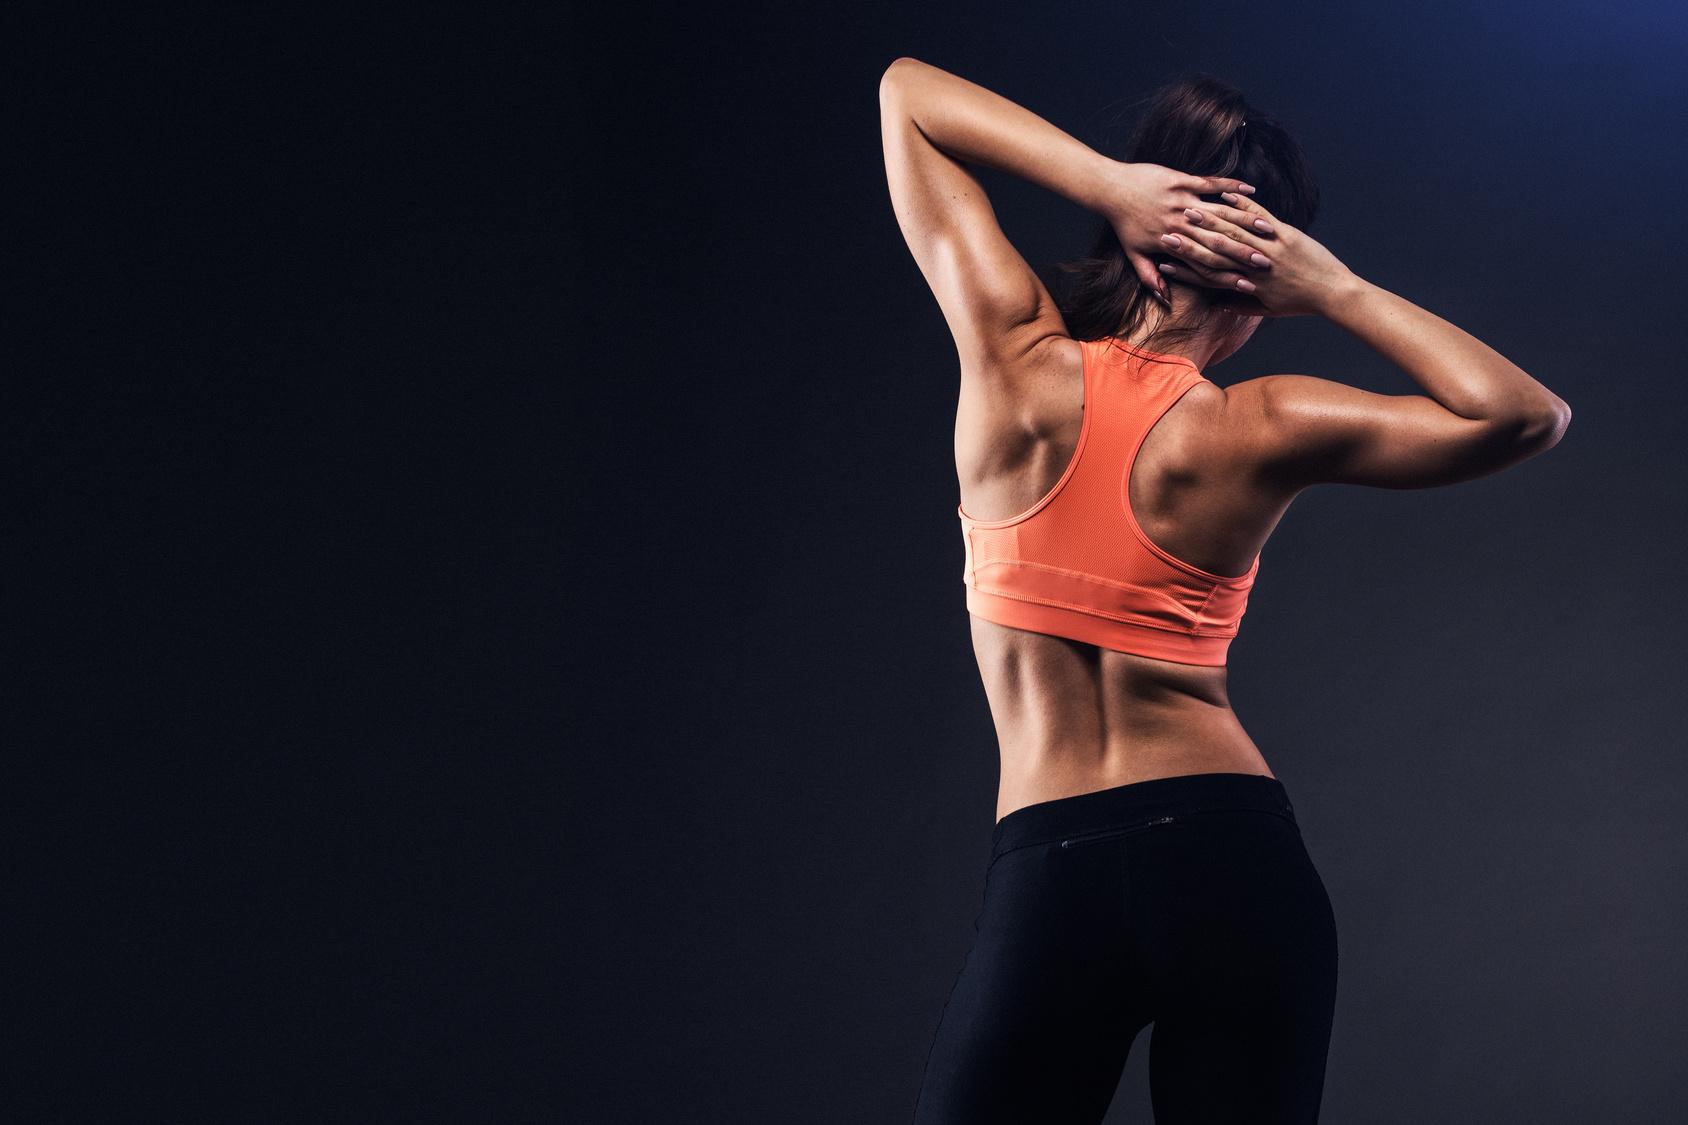 Frau mit starkem Rücken